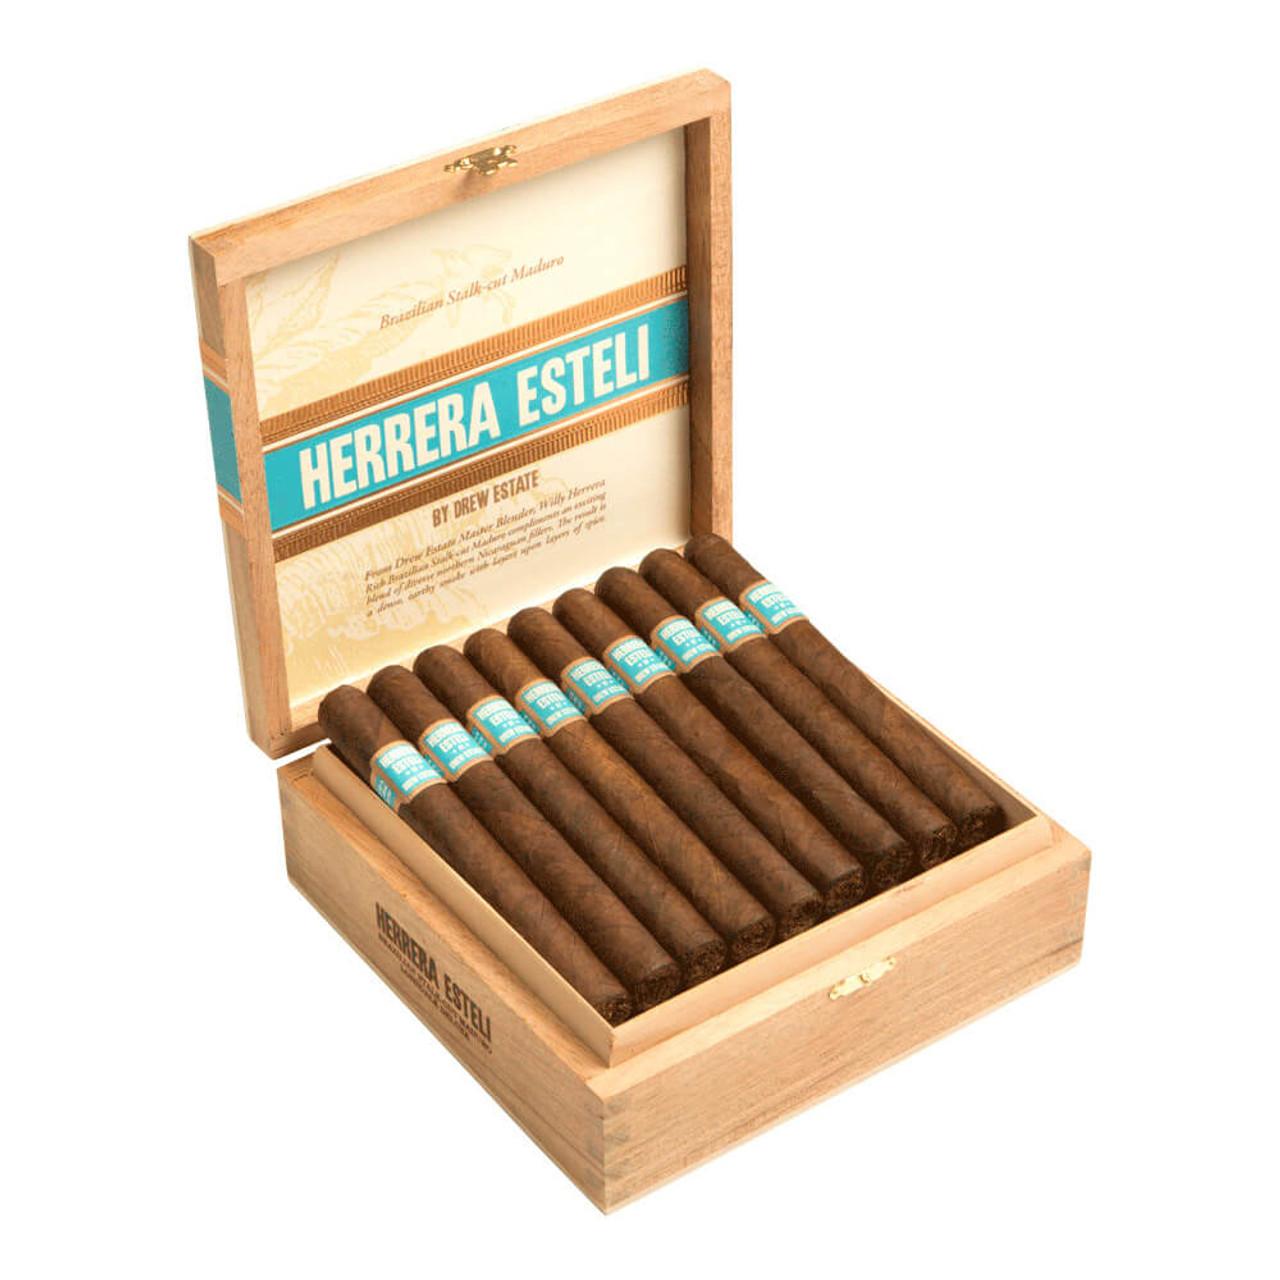 Herrera Esteli Brazilian Maduro Toro Especial Cigars - 6 x 52 (Box of 25)